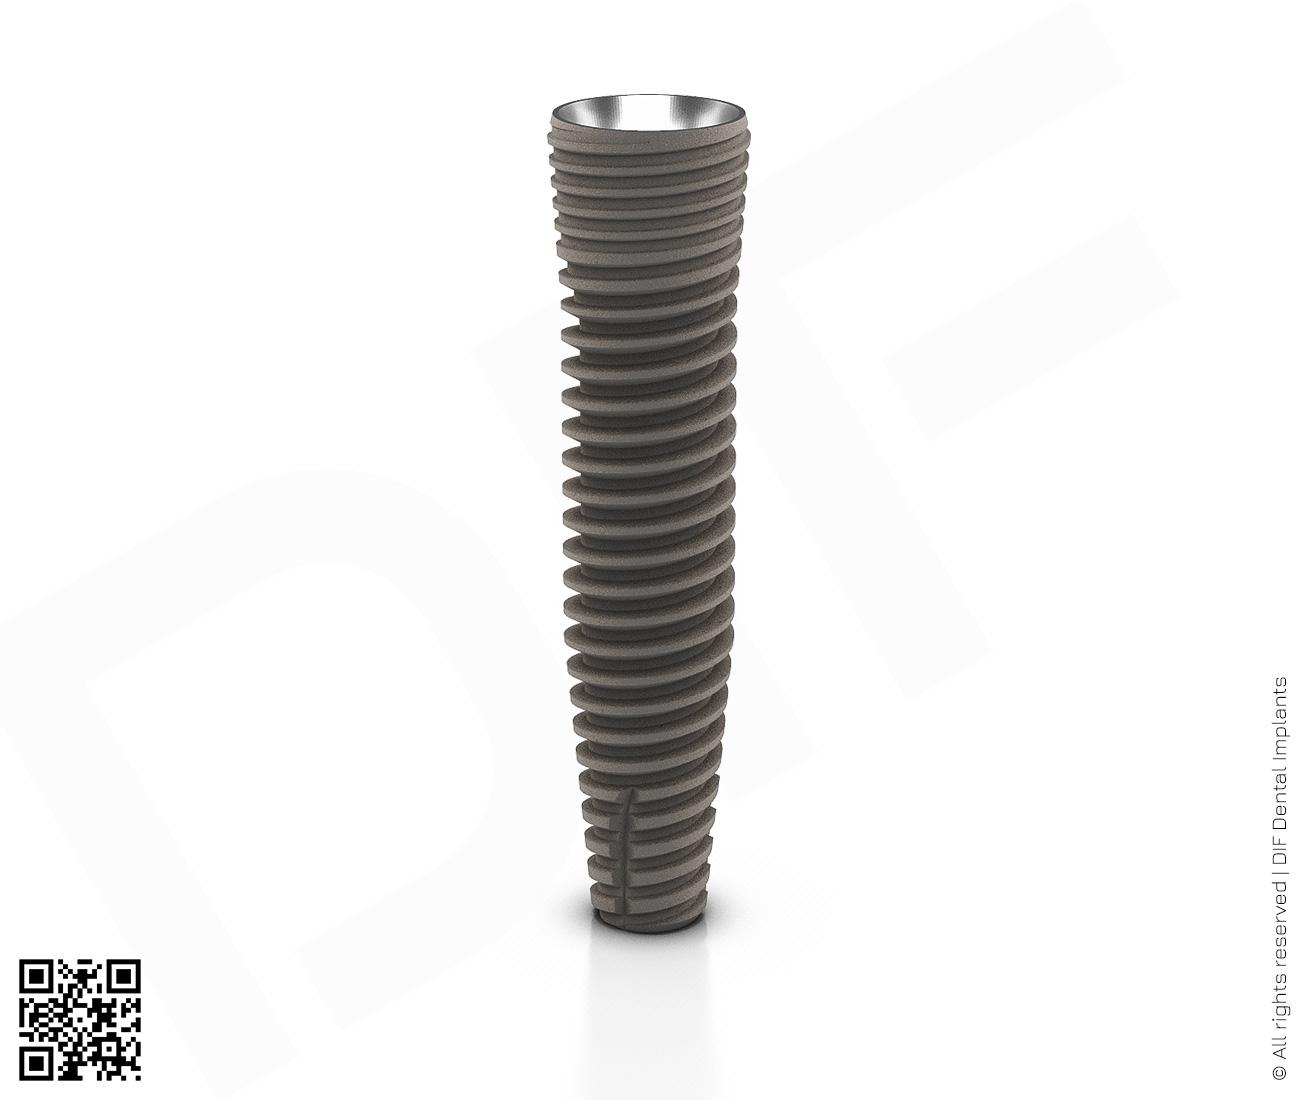 Фото имплантат mainstream fine d3.75 мм – l16.0 мм производства DIF.